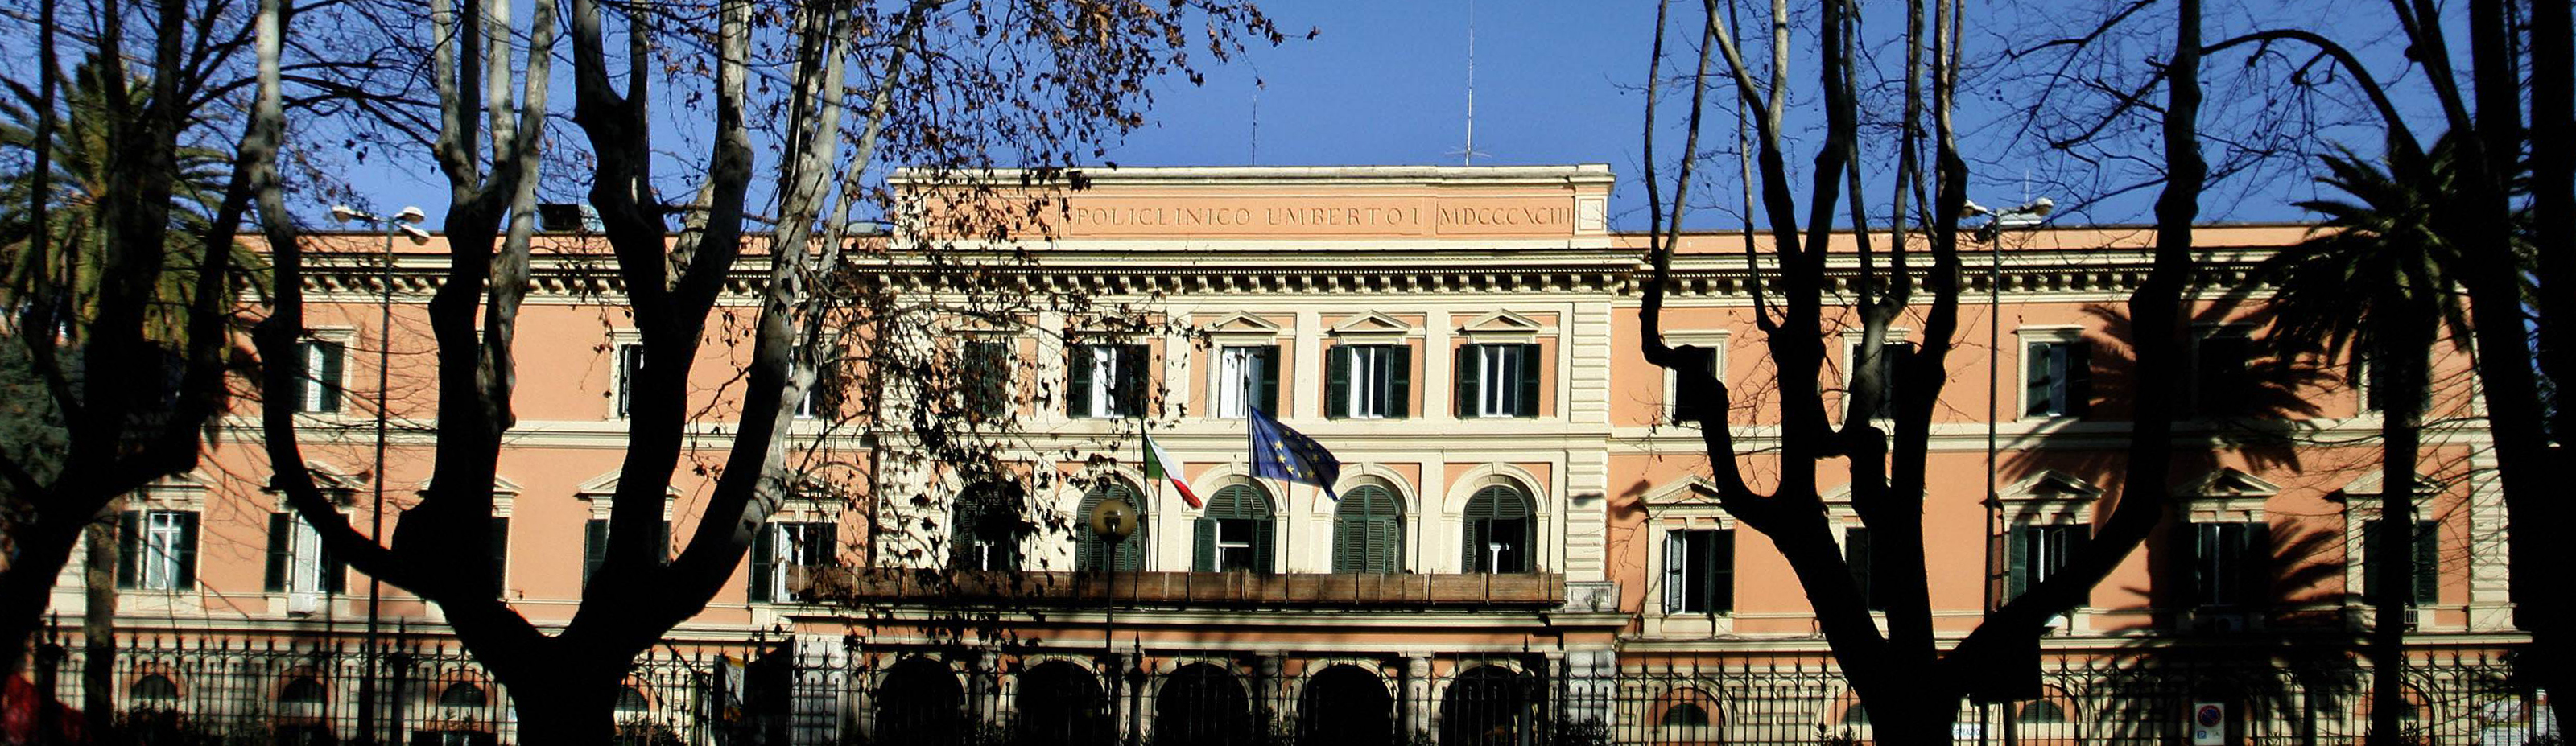 POLICLINICO UMBERTO 1 ROMA